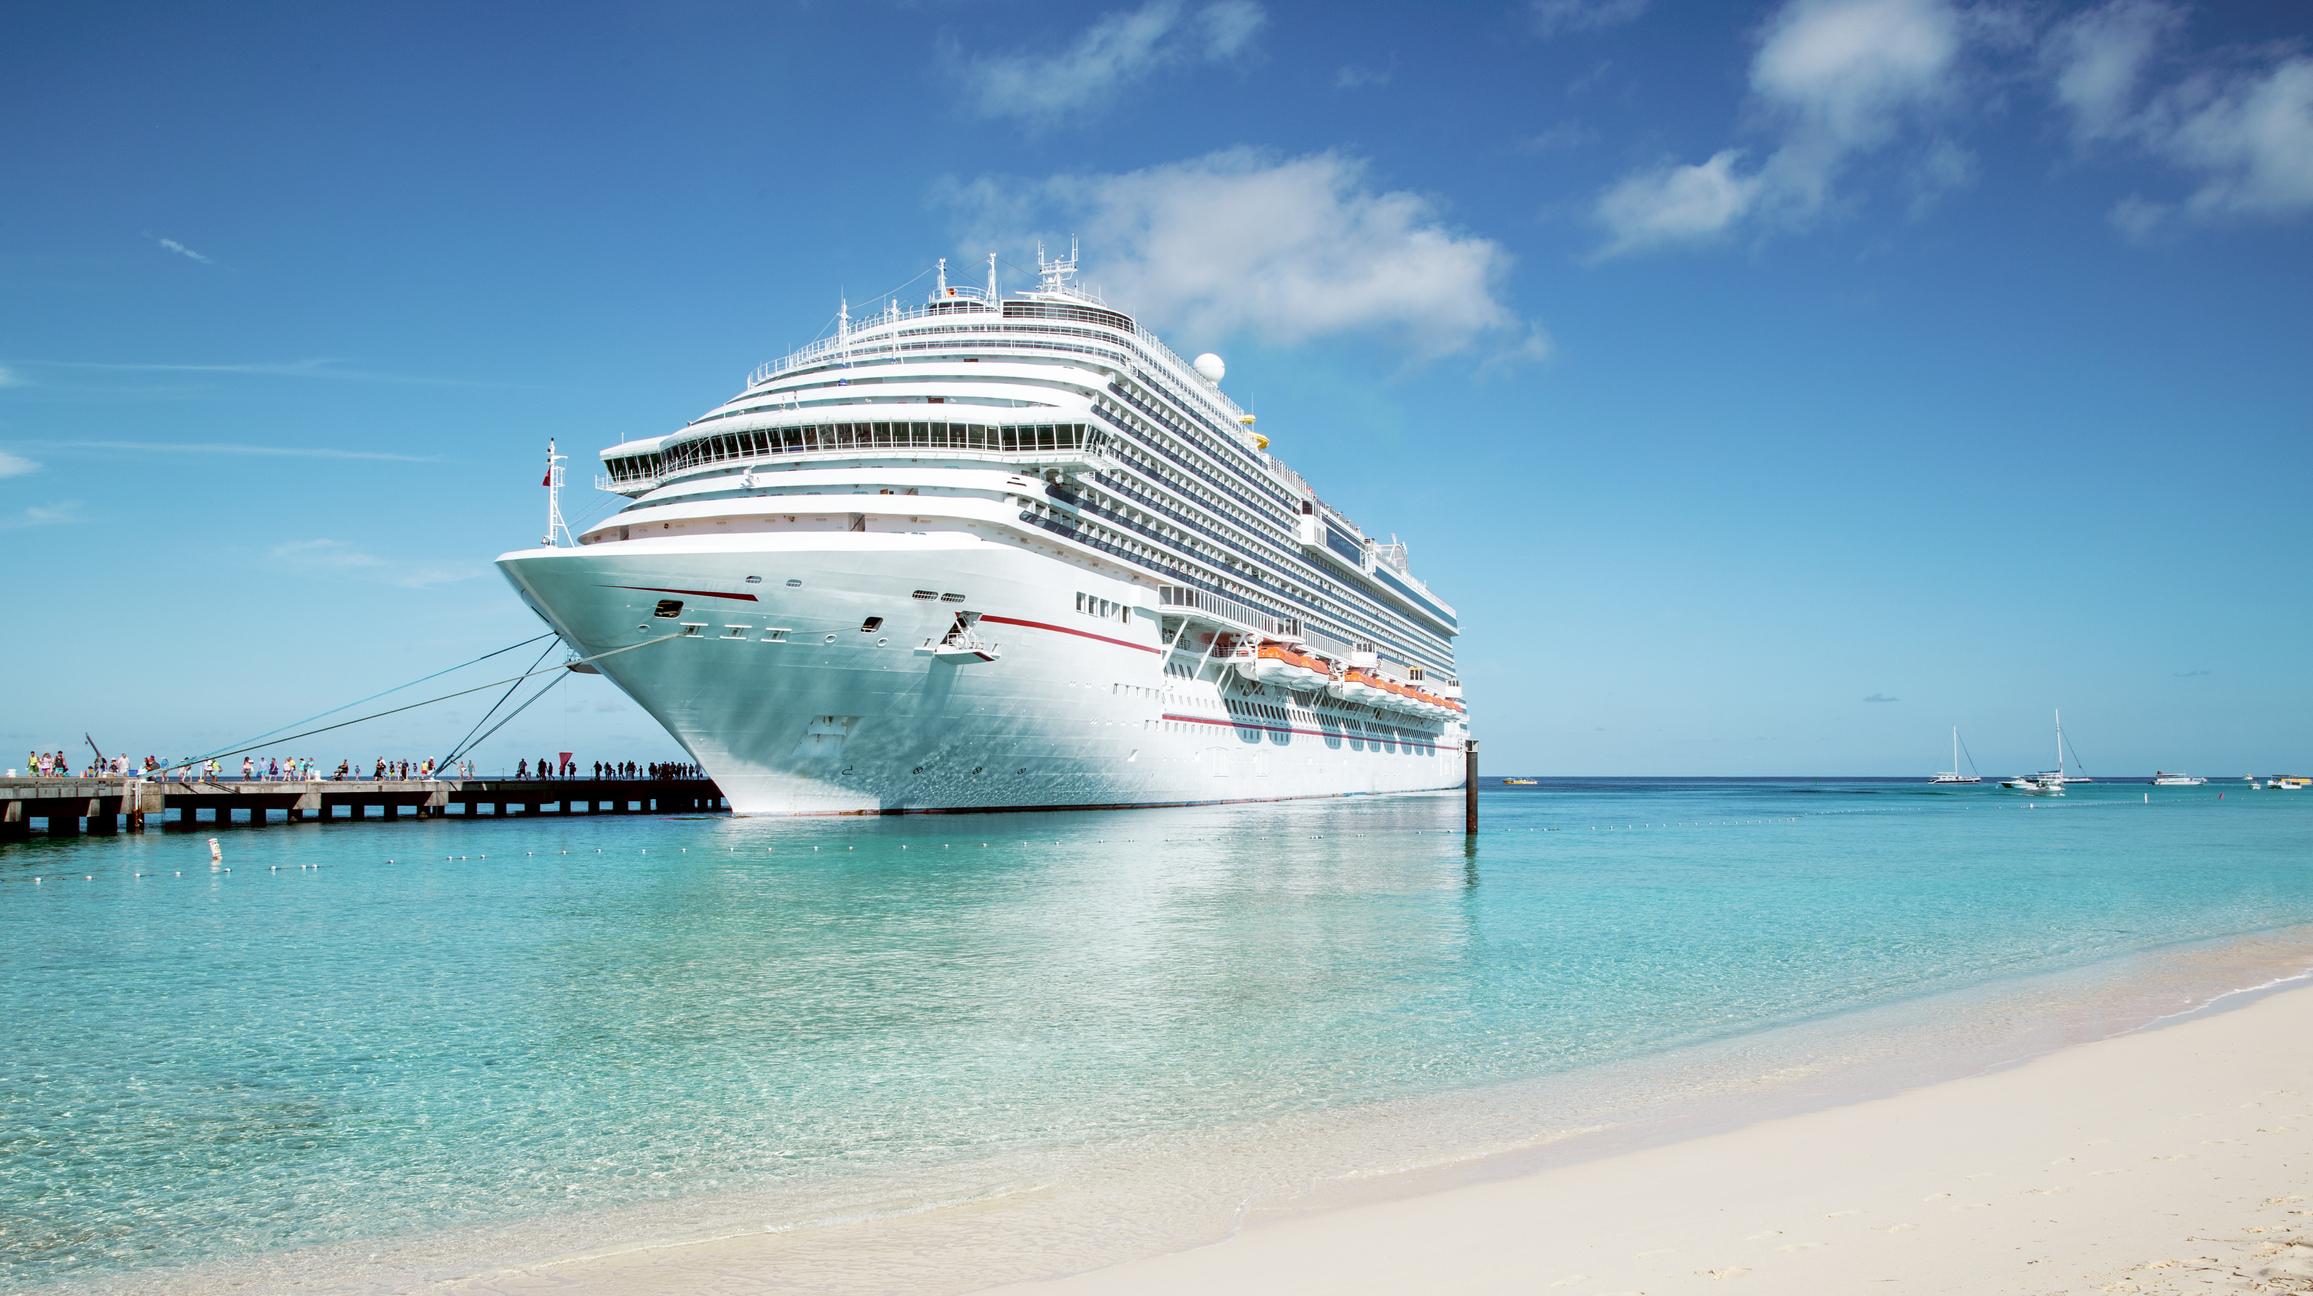 Cruise-ship-moored-at-Grand-Turk-island,-the-Caribbeans-901820444_2317x1298.jpeg